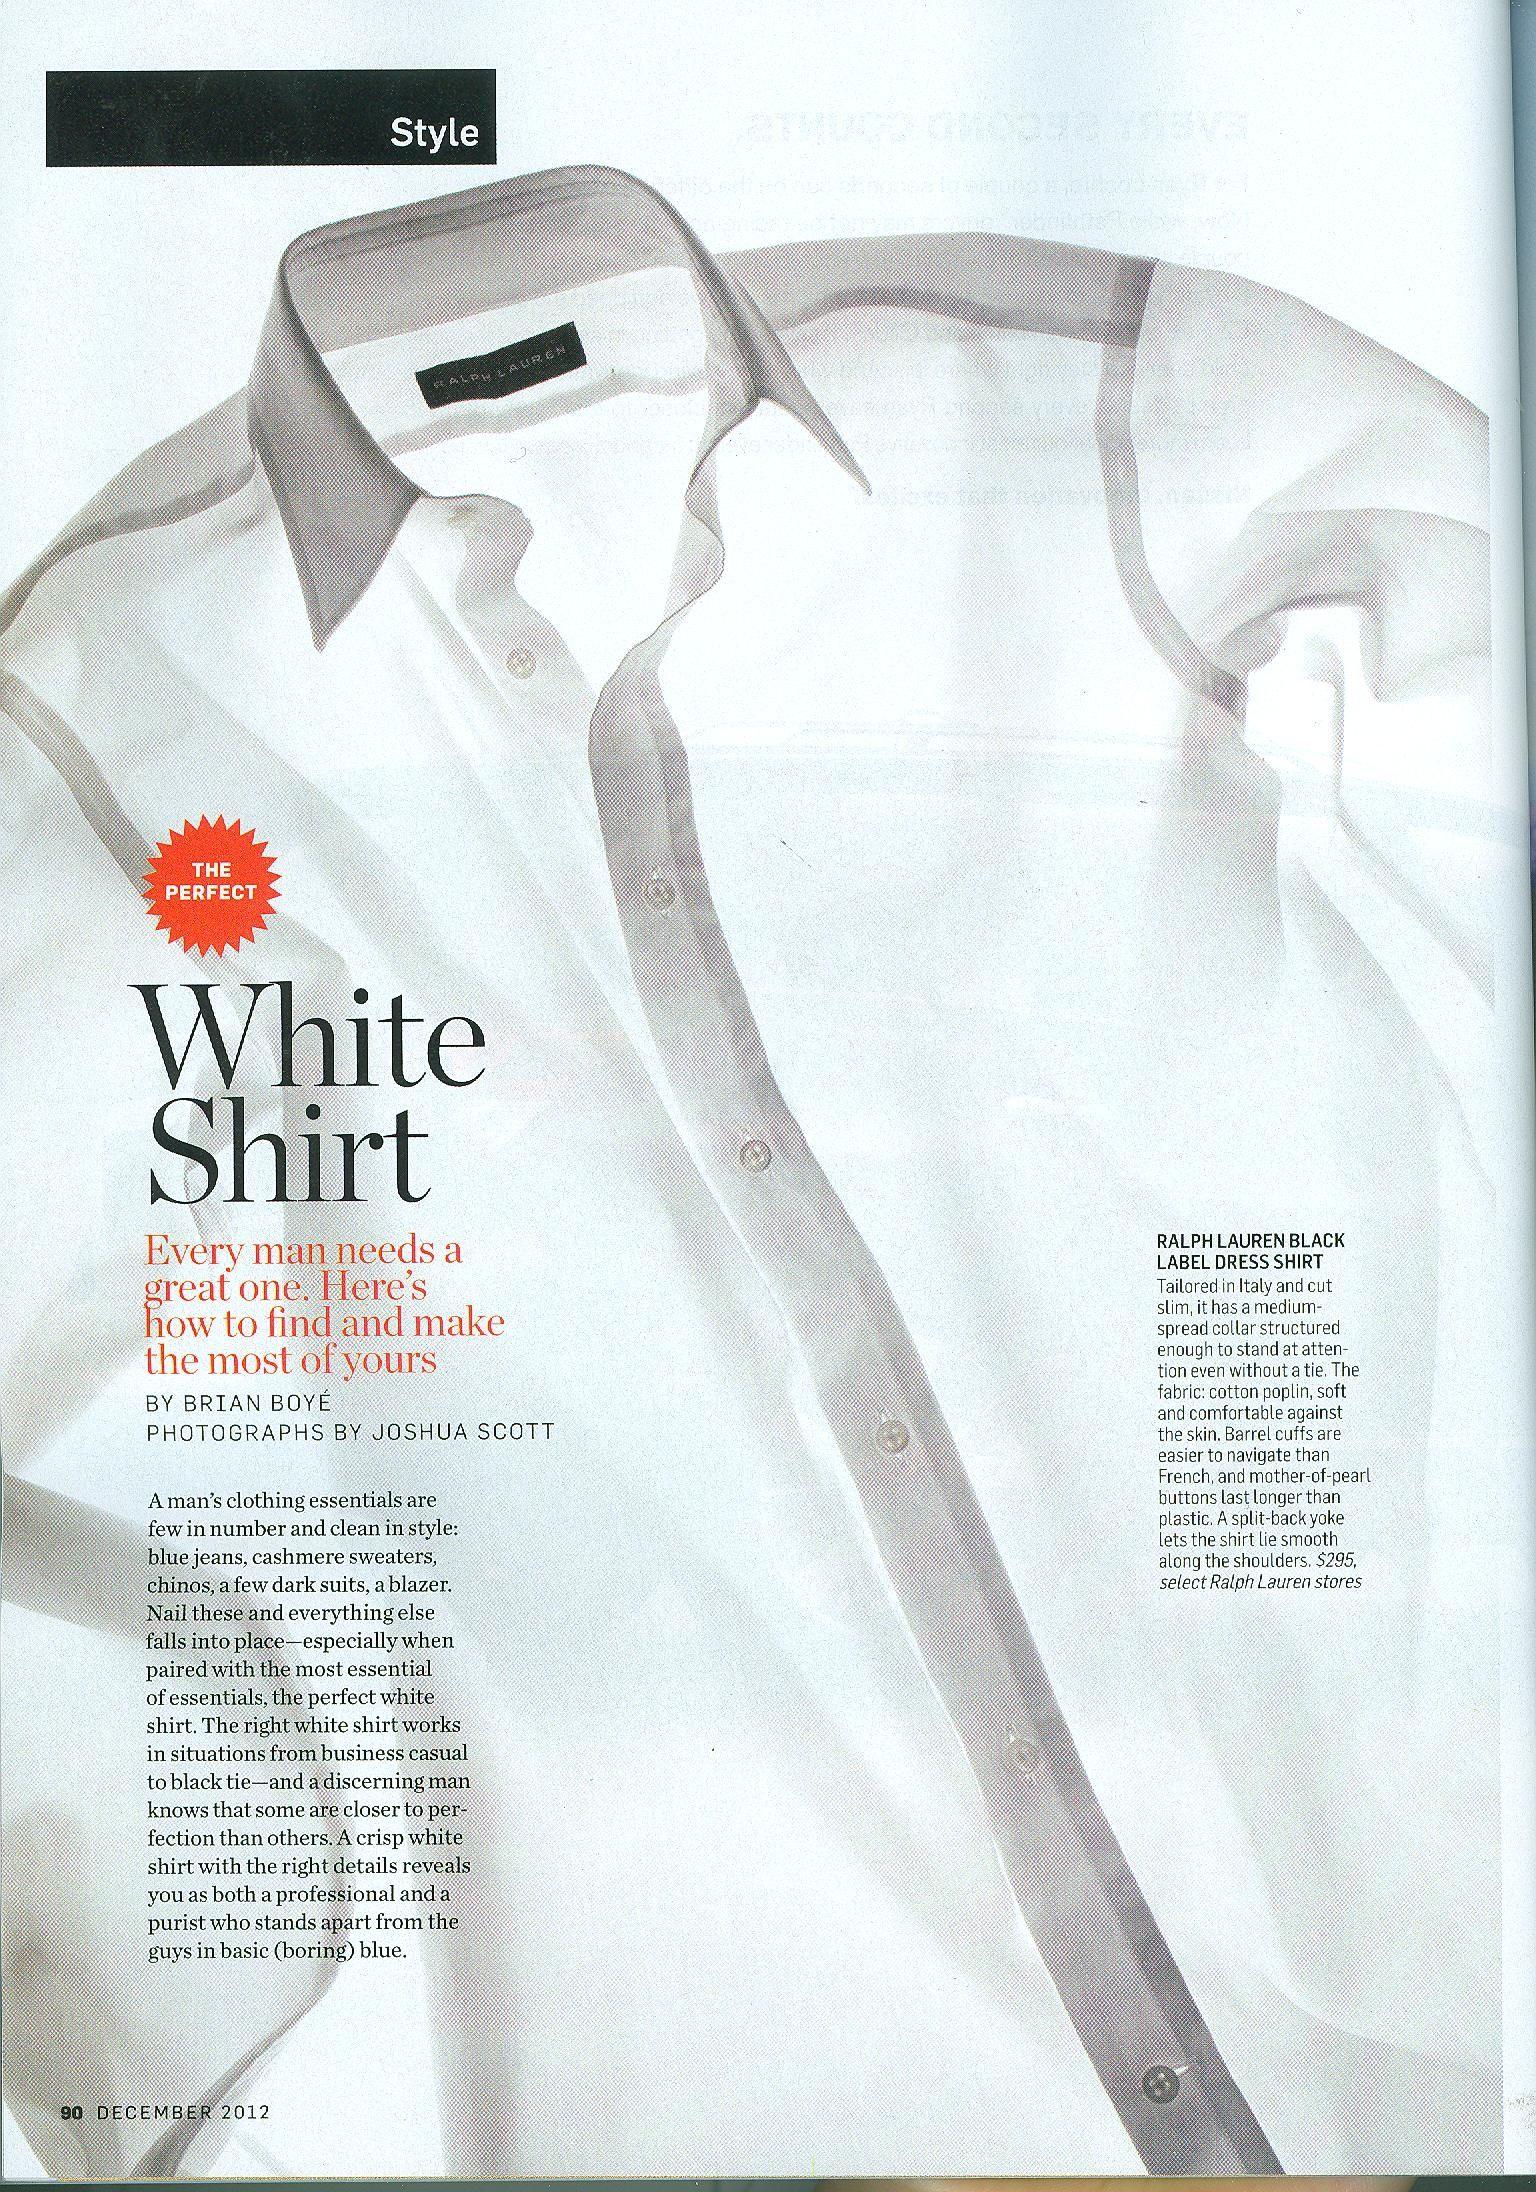 The Perfect White Shirt Ralph Lauren Black Label Dress Shirt